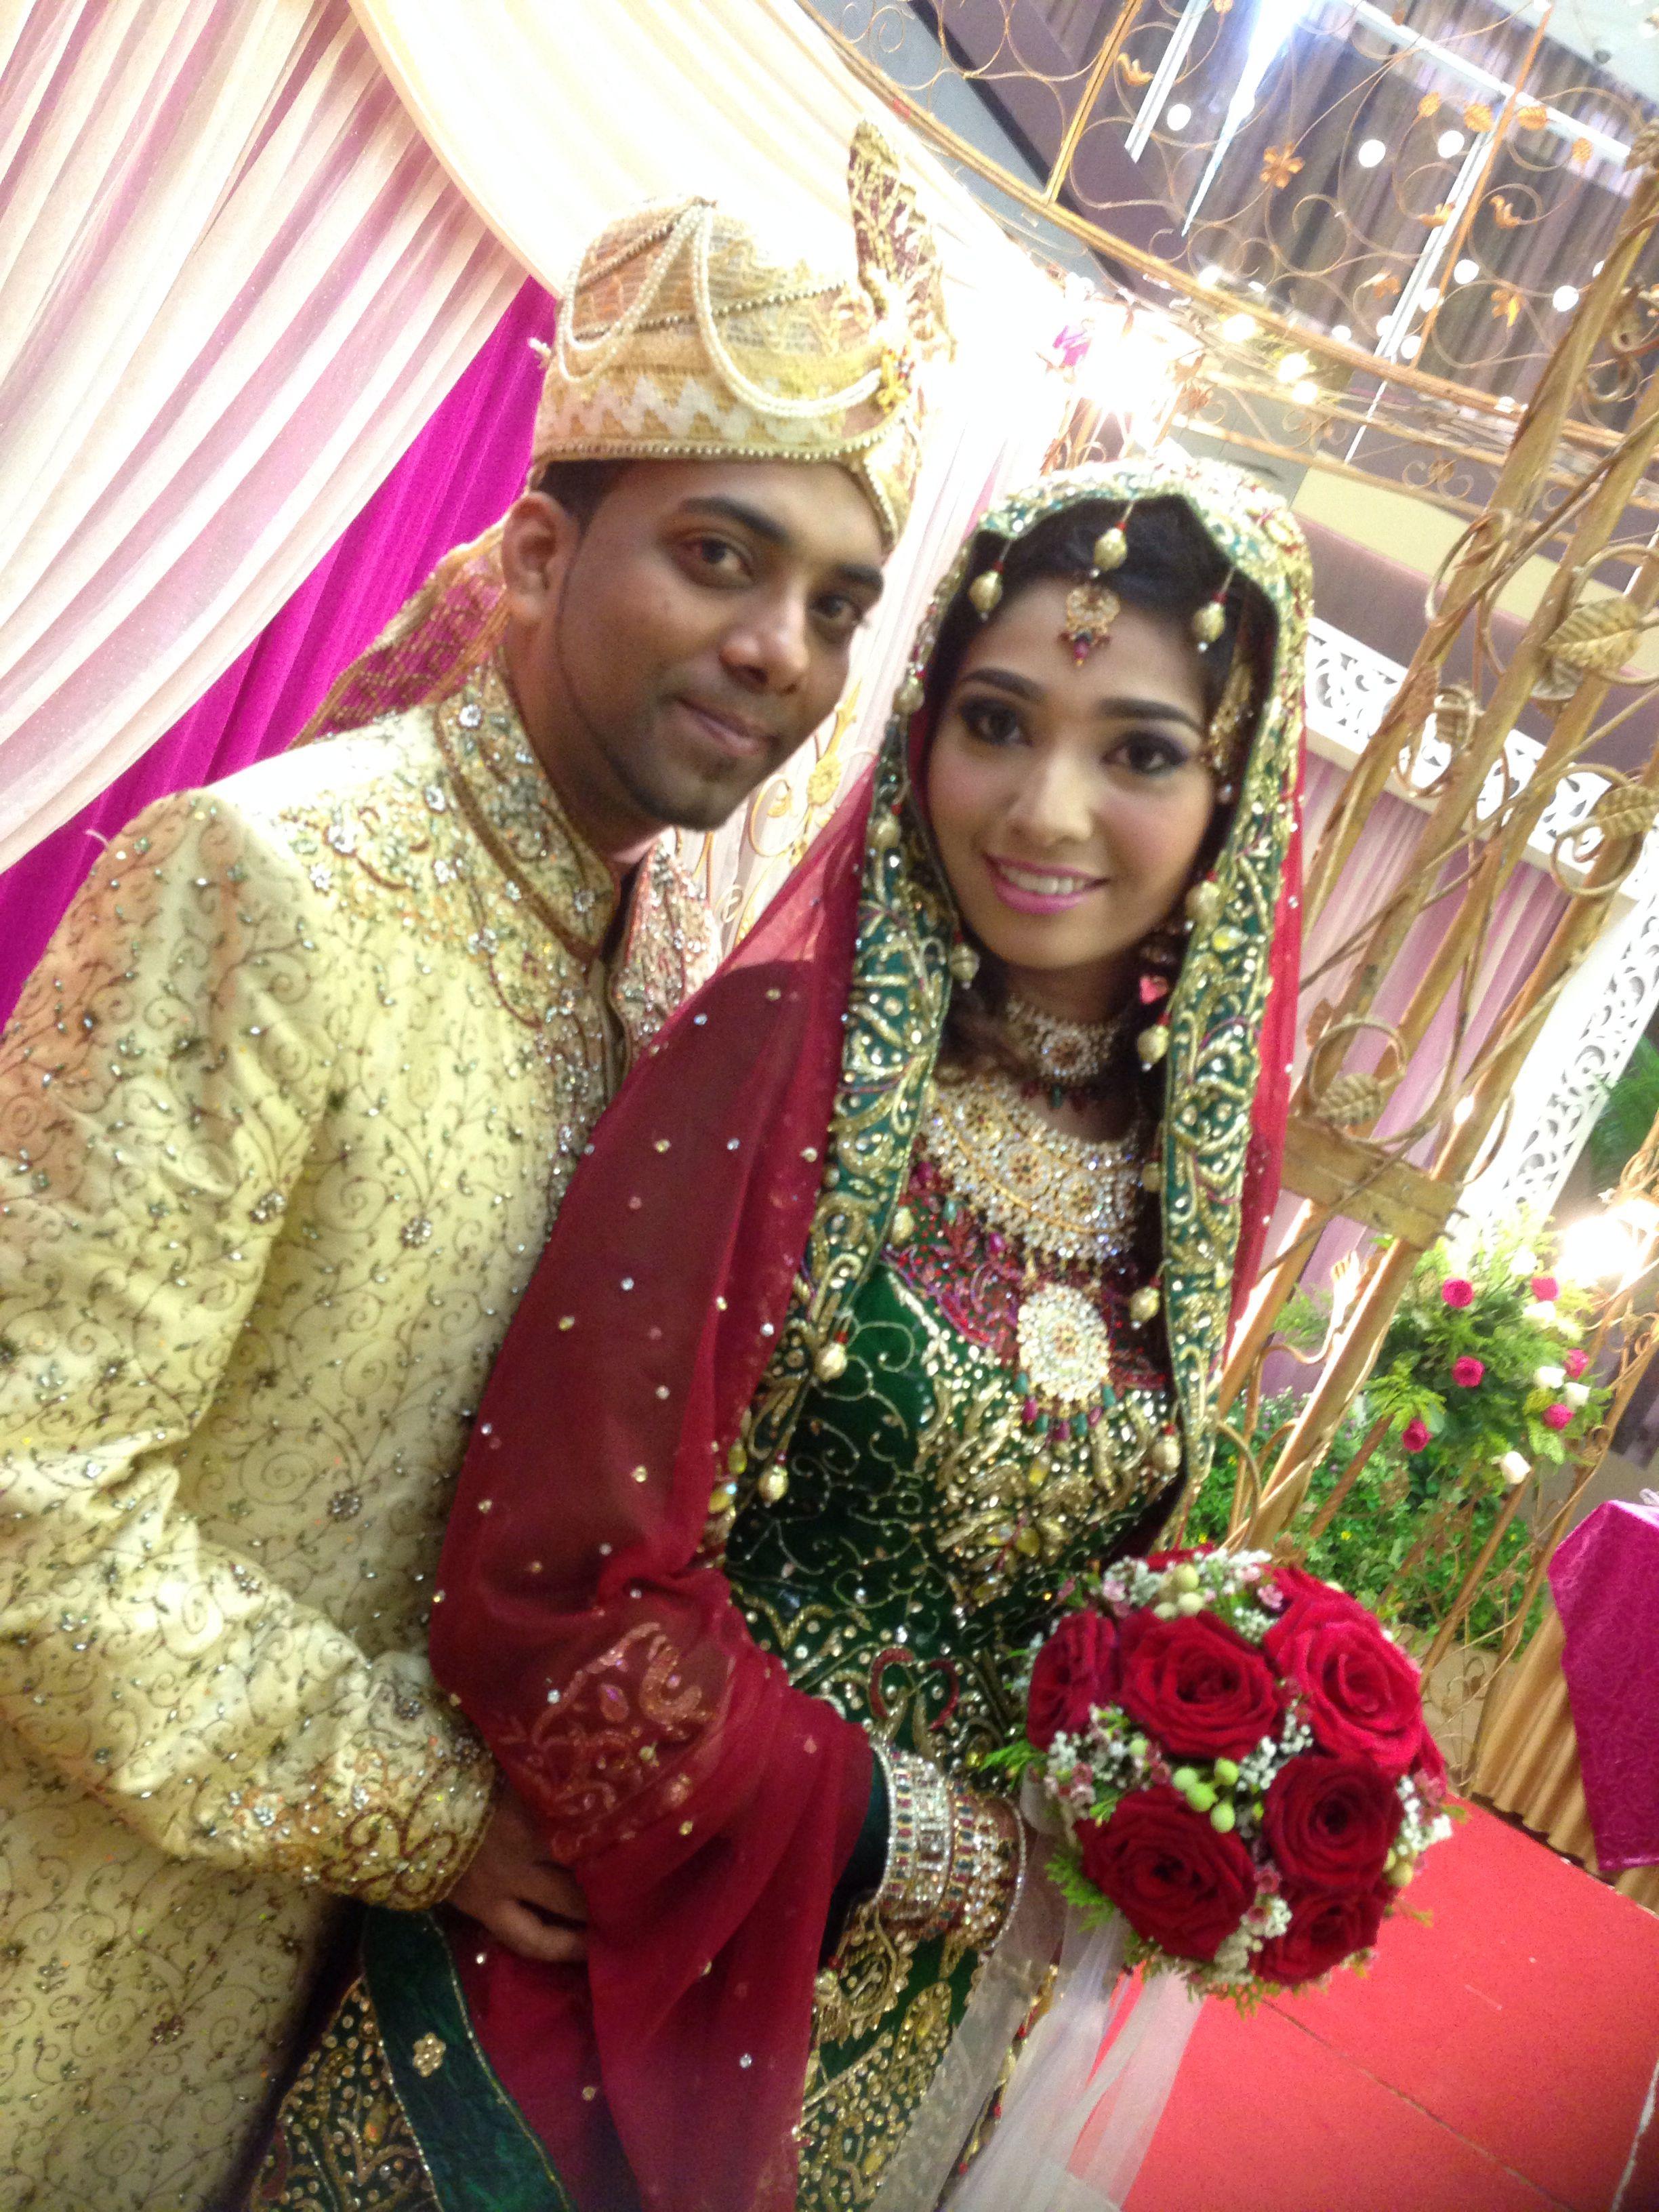 The newly wed outfits Mumbai Image By Nora Sahari